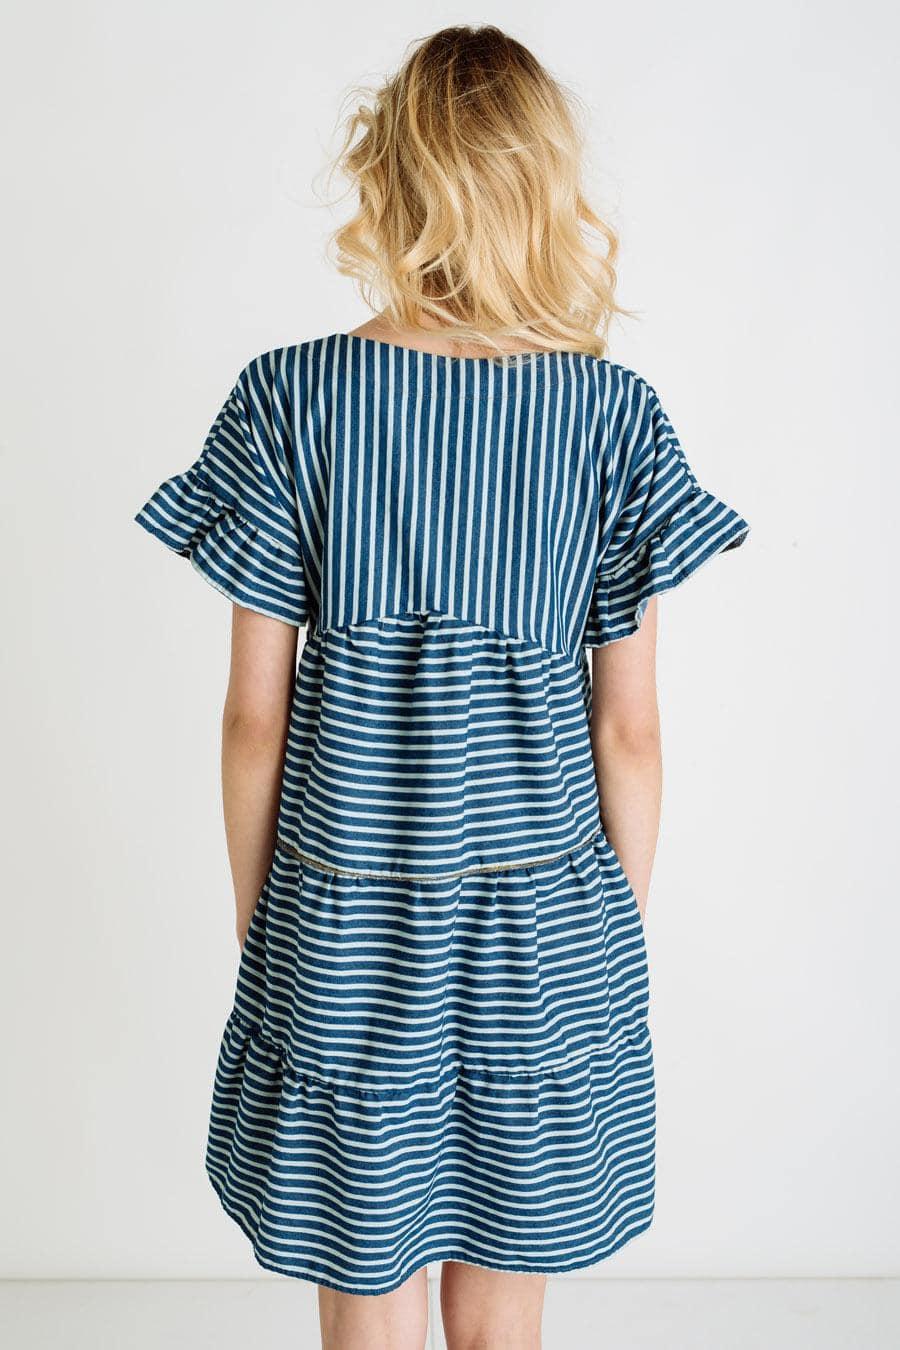 jagger zenska haljina kolekcija prolece leto 2021 ss 2021 kupi online jg5501 09 3